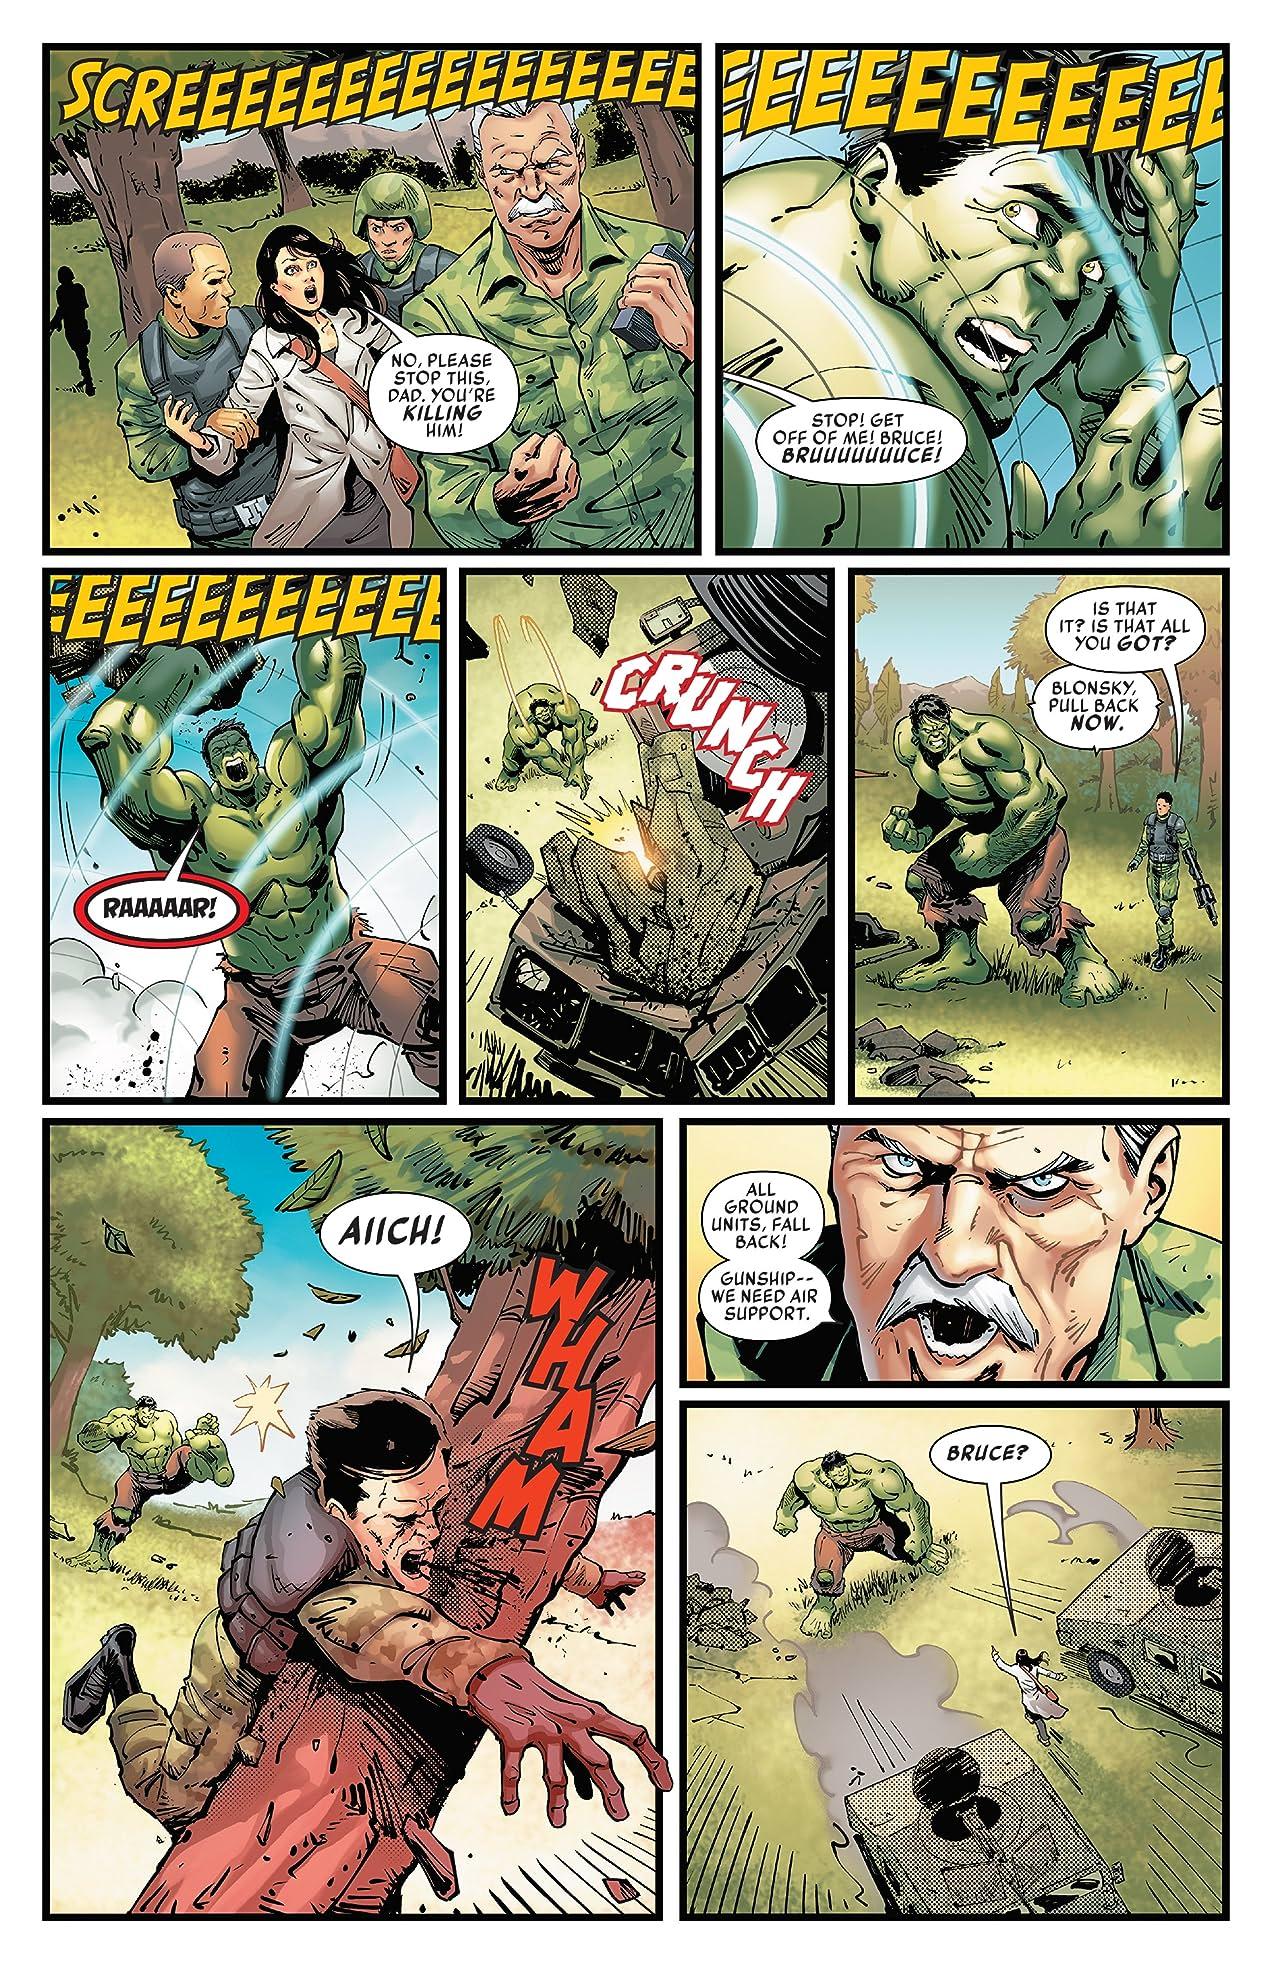 Marvel's Thor: Ragnarok Prelude (2017) #2 (of 4)